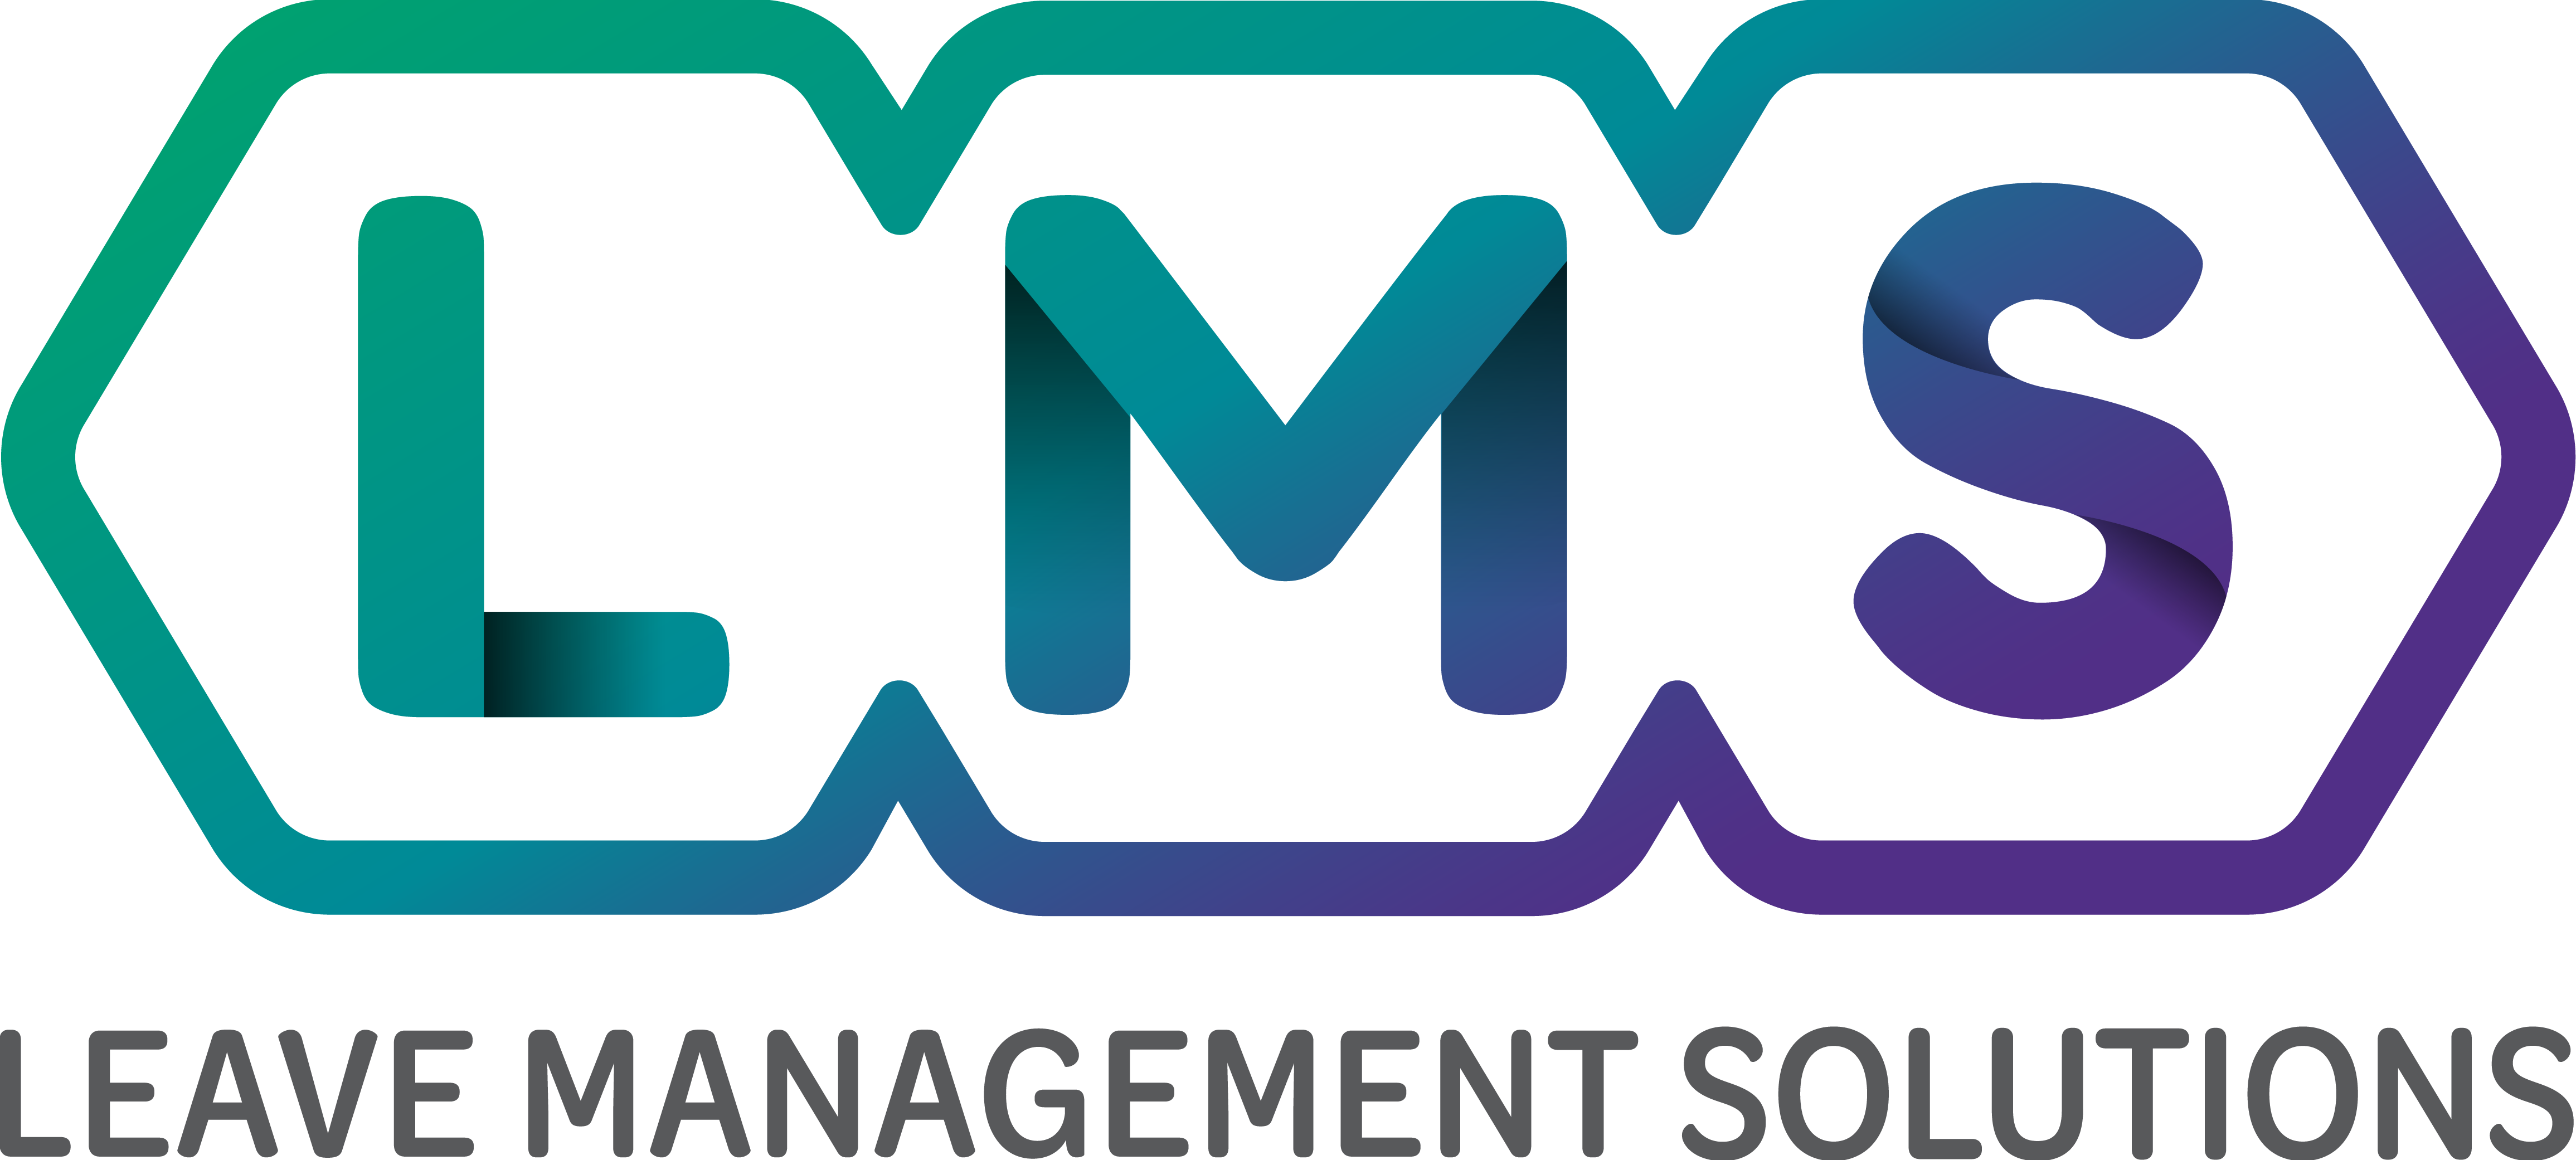 Leave Management Solutions